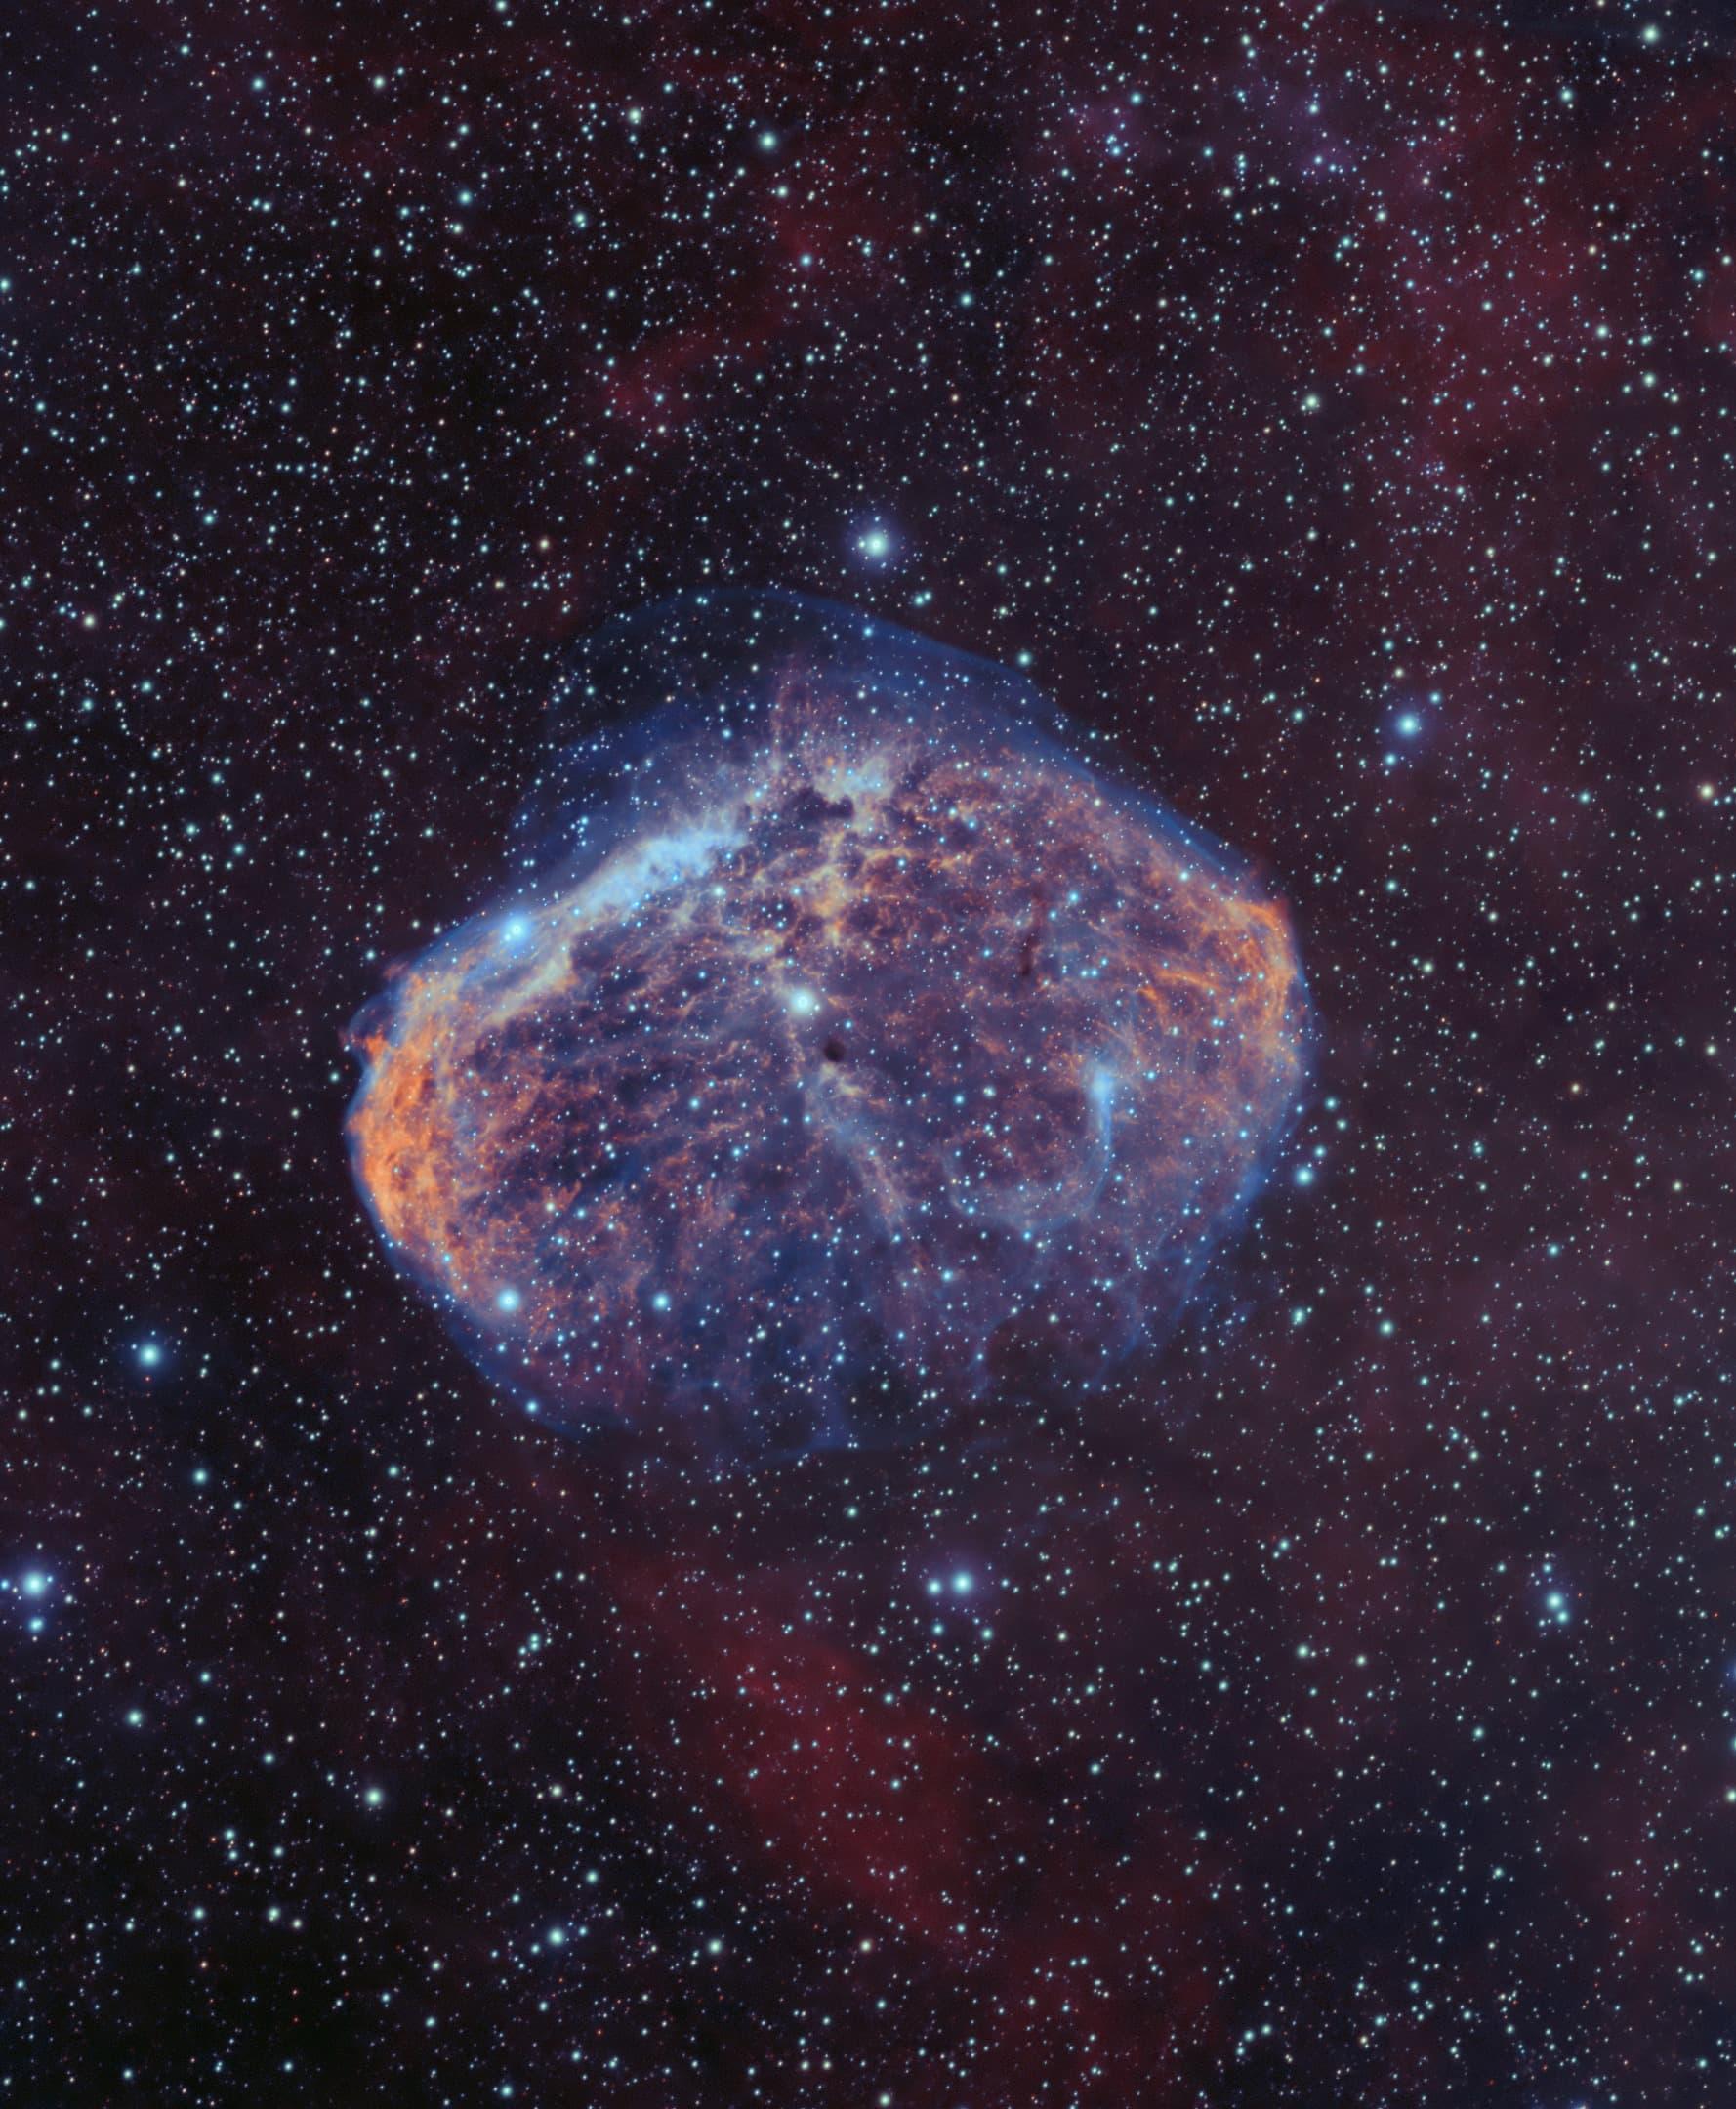 NGC 6888 - Bicolor